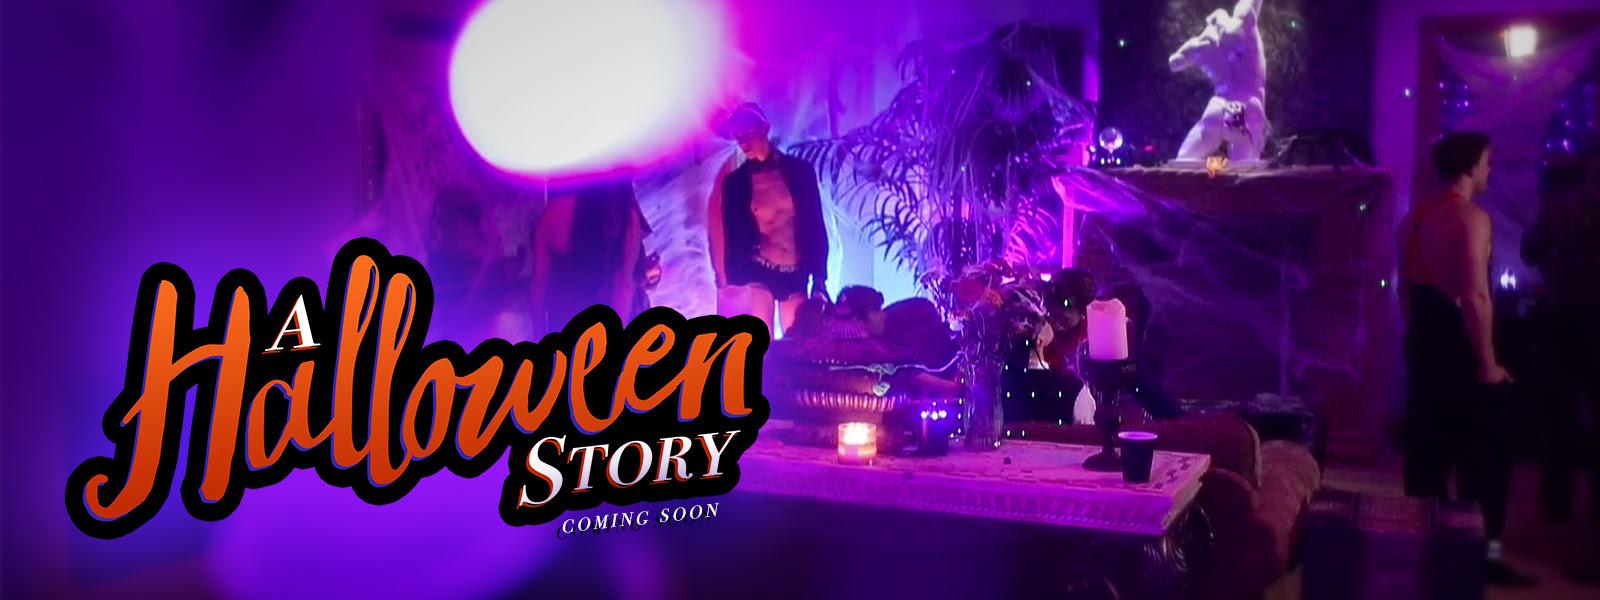 A Halloween Story: Trailer